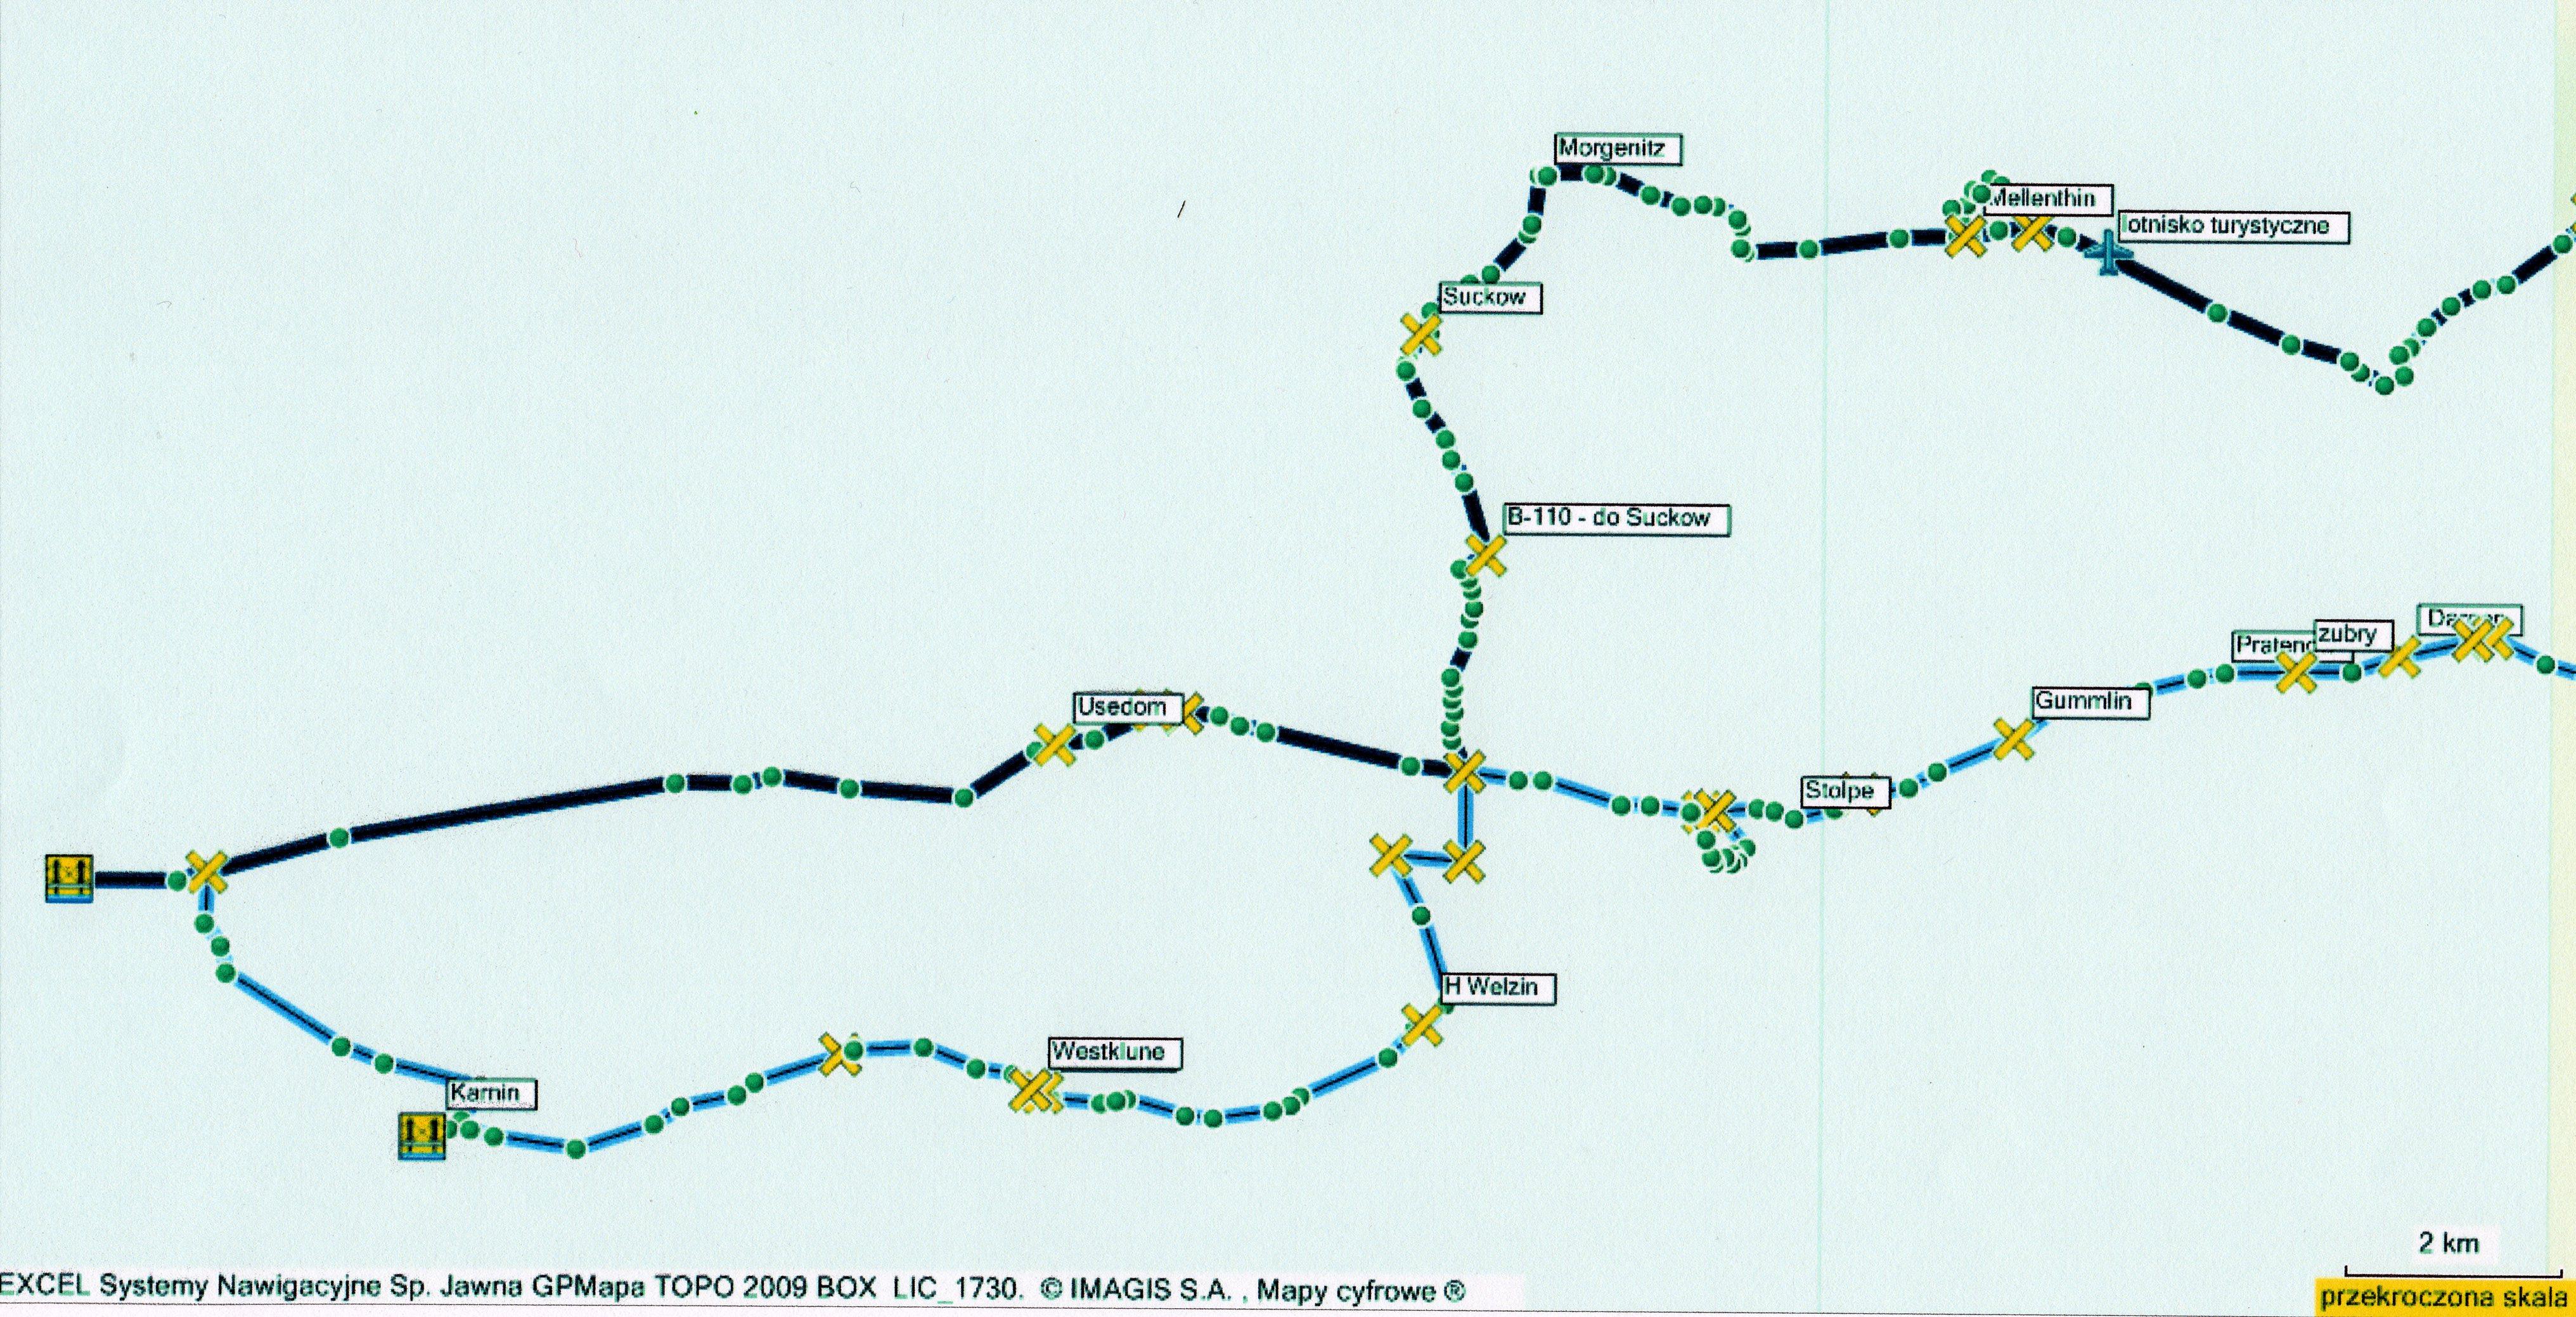 2015.08.16 - TRASA KARNIN-2 jpg